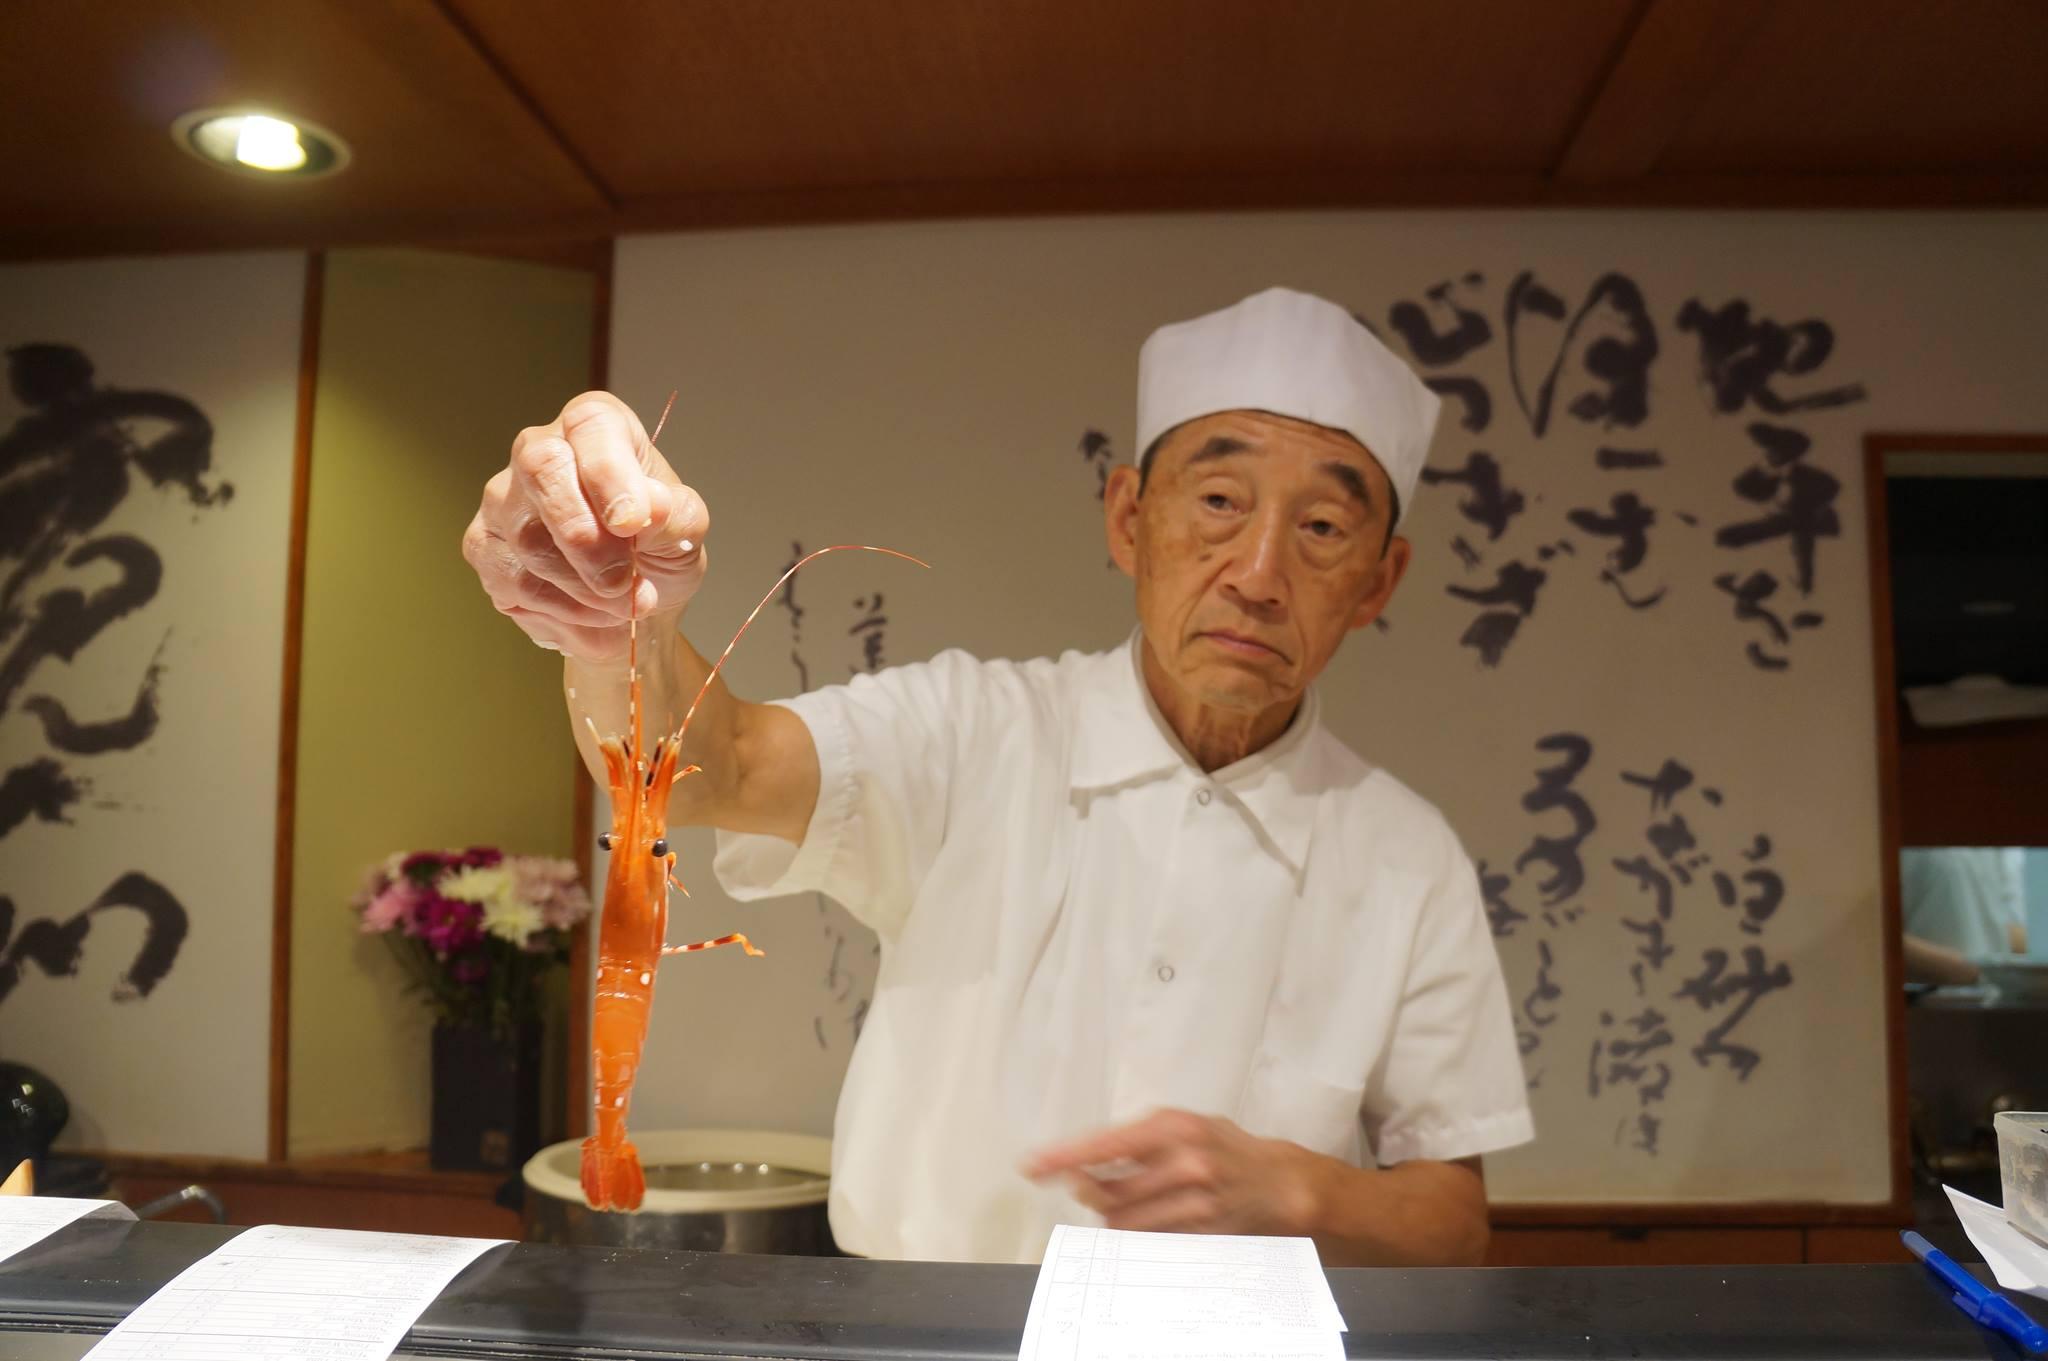 Shiro shows off a fresh catch at his namesake sushi restaurant. Photo by Runei Matsumoto.